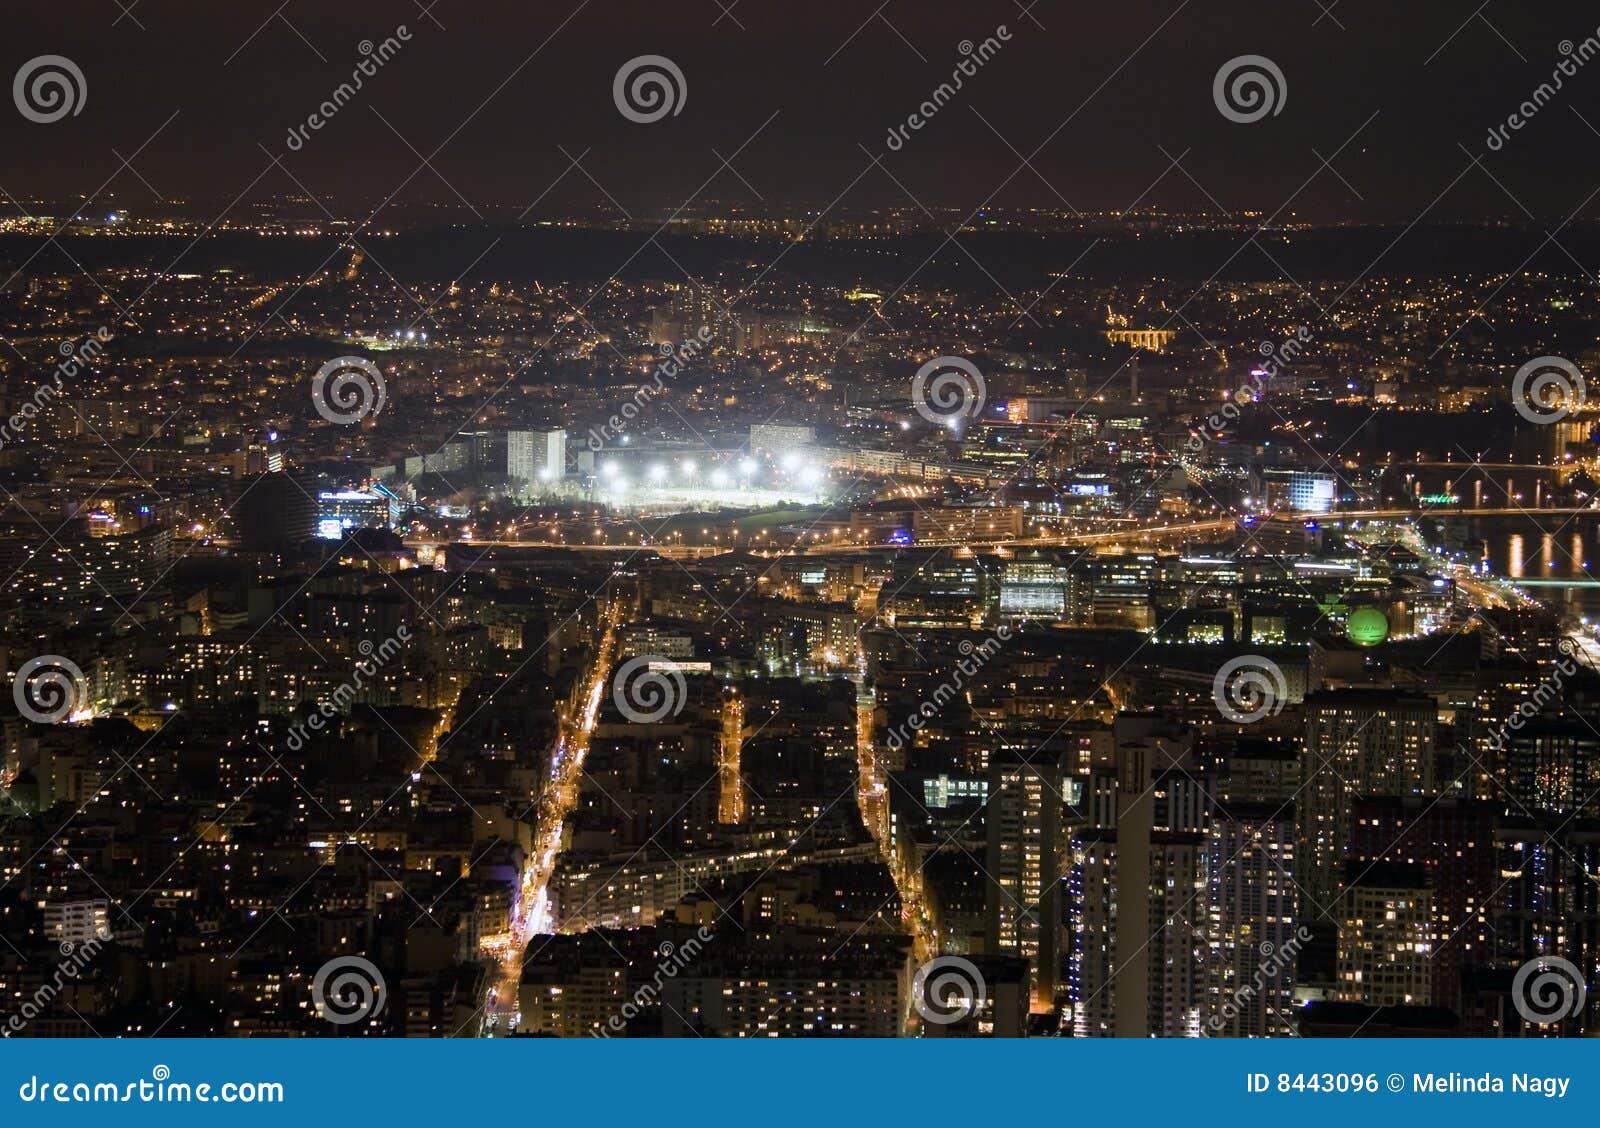 View on Paris at night